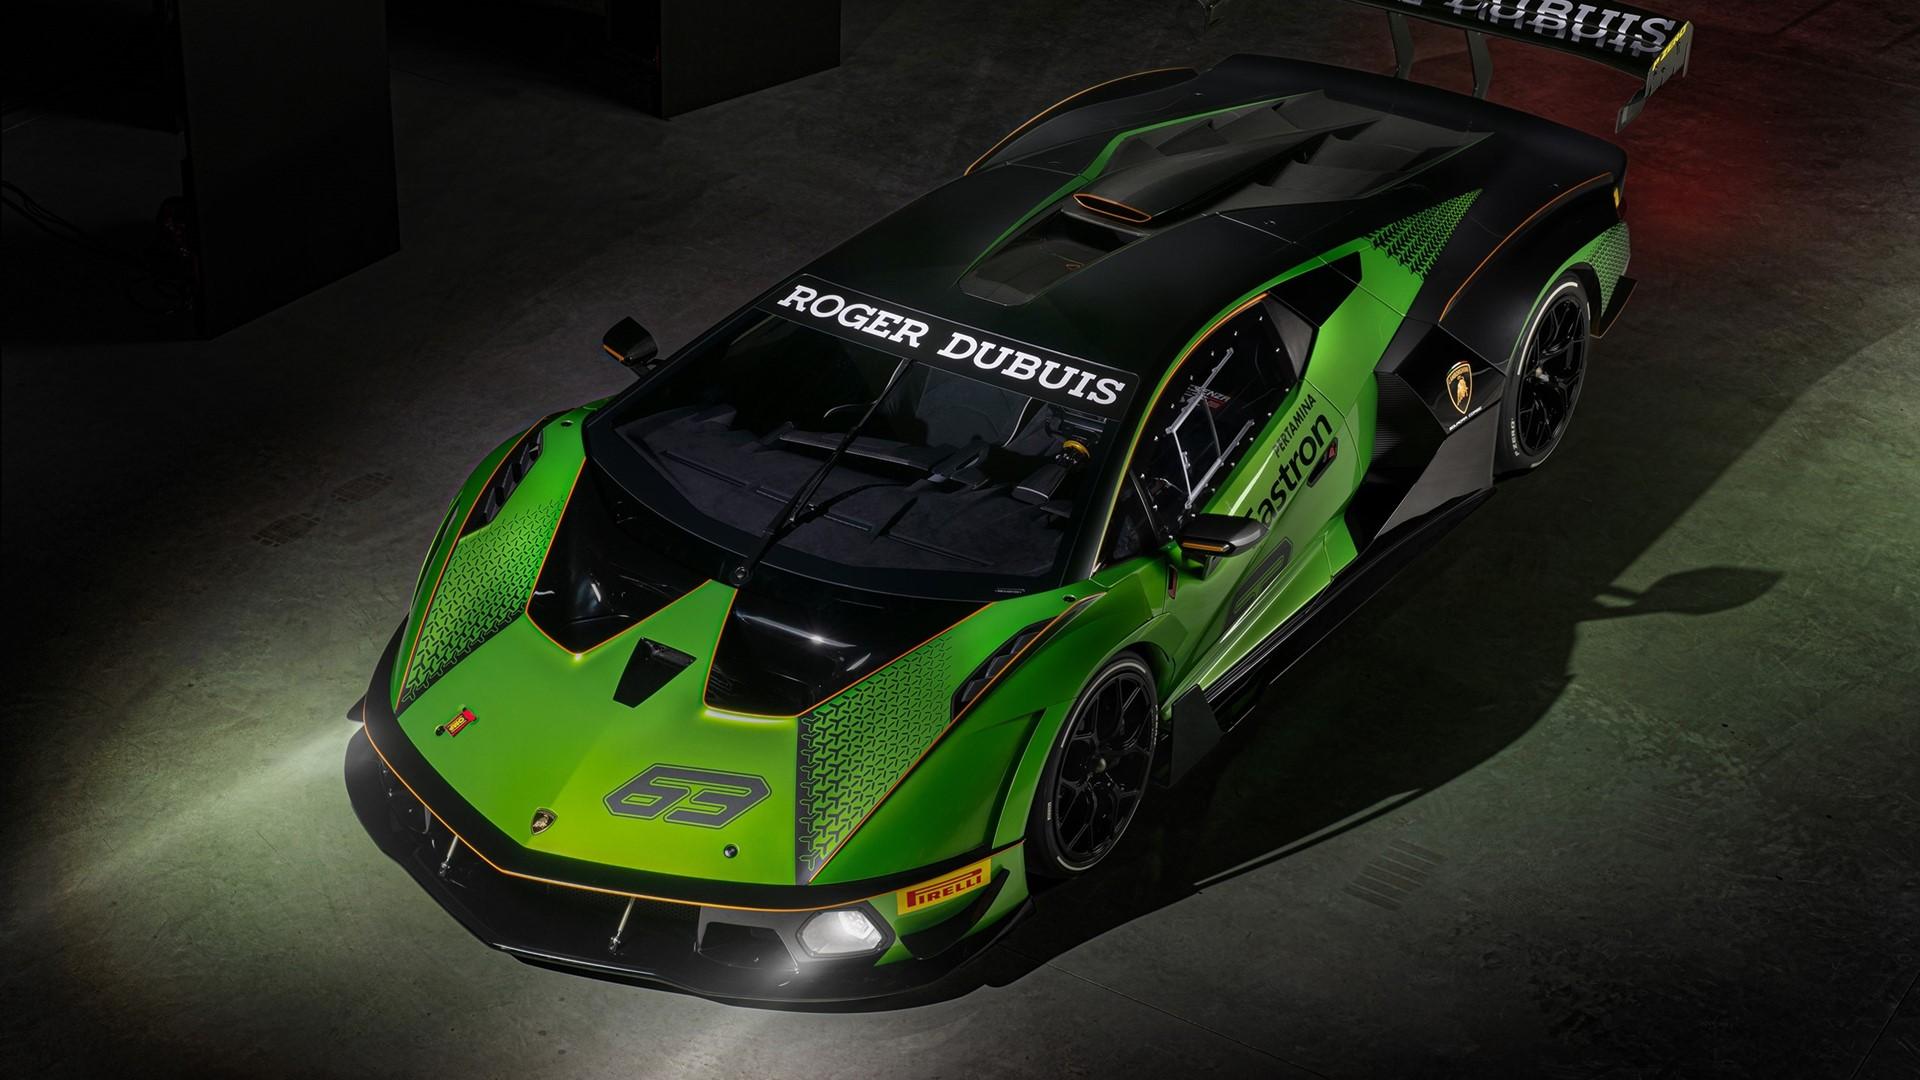 A record September for Automobili Lamborghini - Image 2